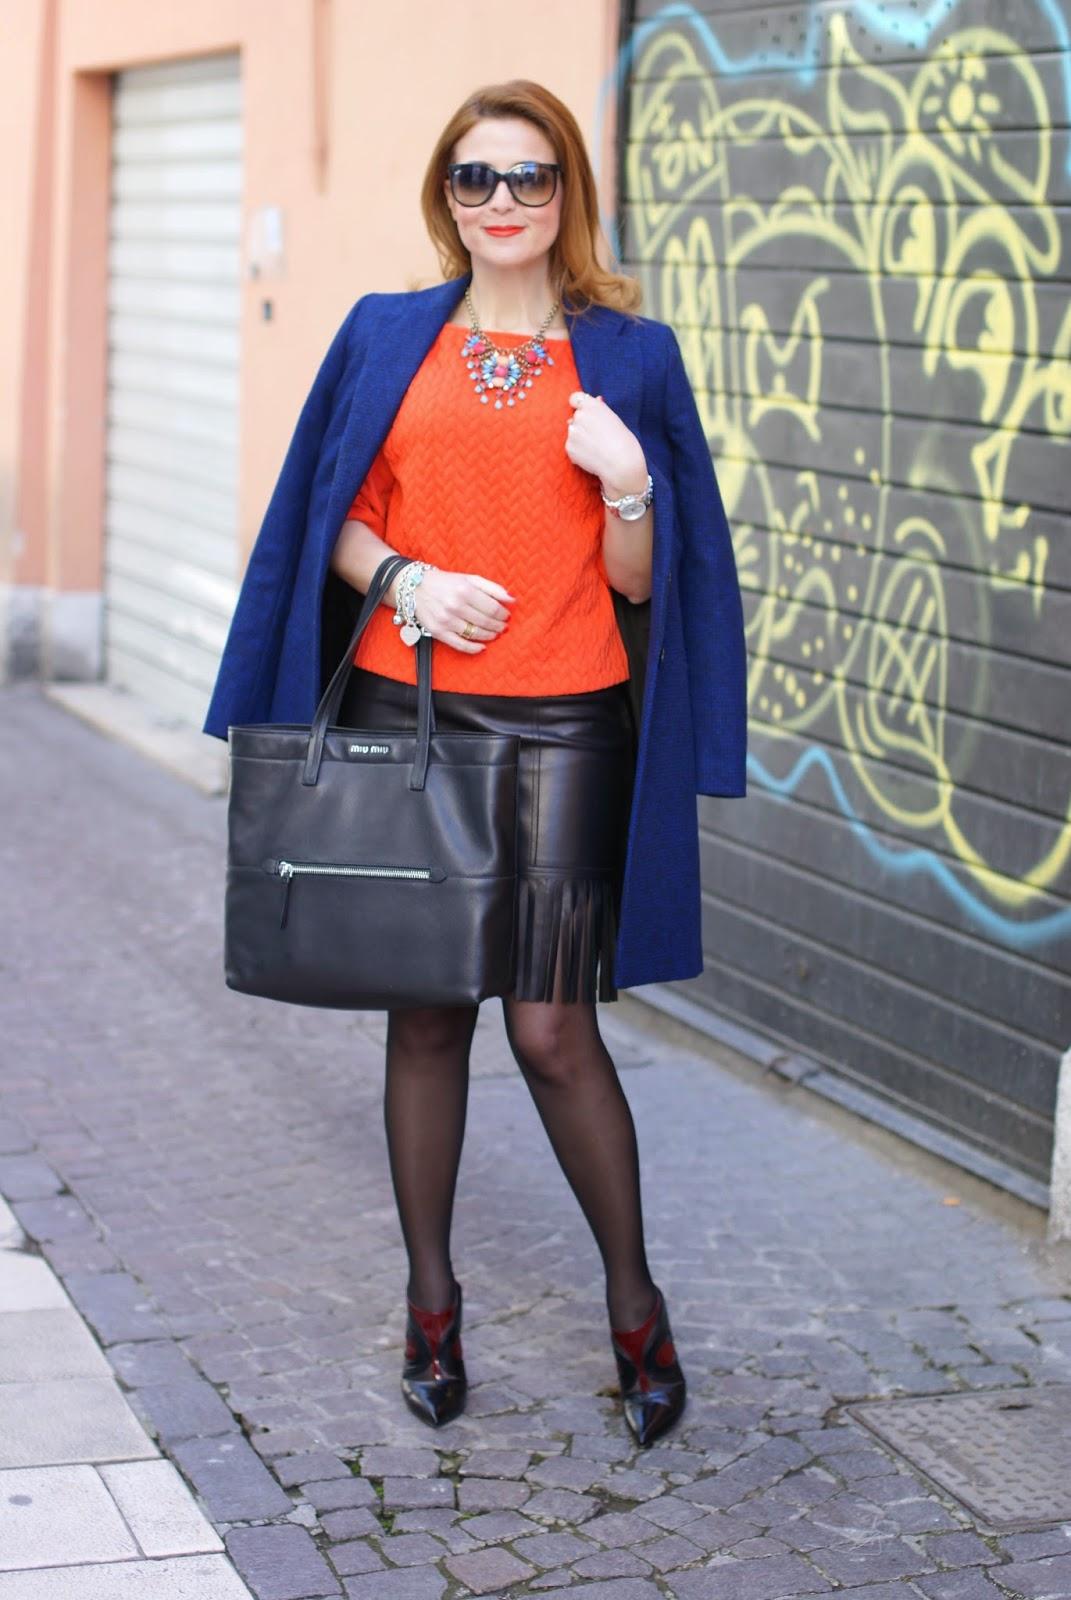 Blumarine leather fringed skirt, fringe hemline skirt, ray-ban cat eye sunglasses, Miu Miu black tote, bijou brigitte necklace, black sheer tights on legs, Fashion and Cookies fashion blog, fashion blogger